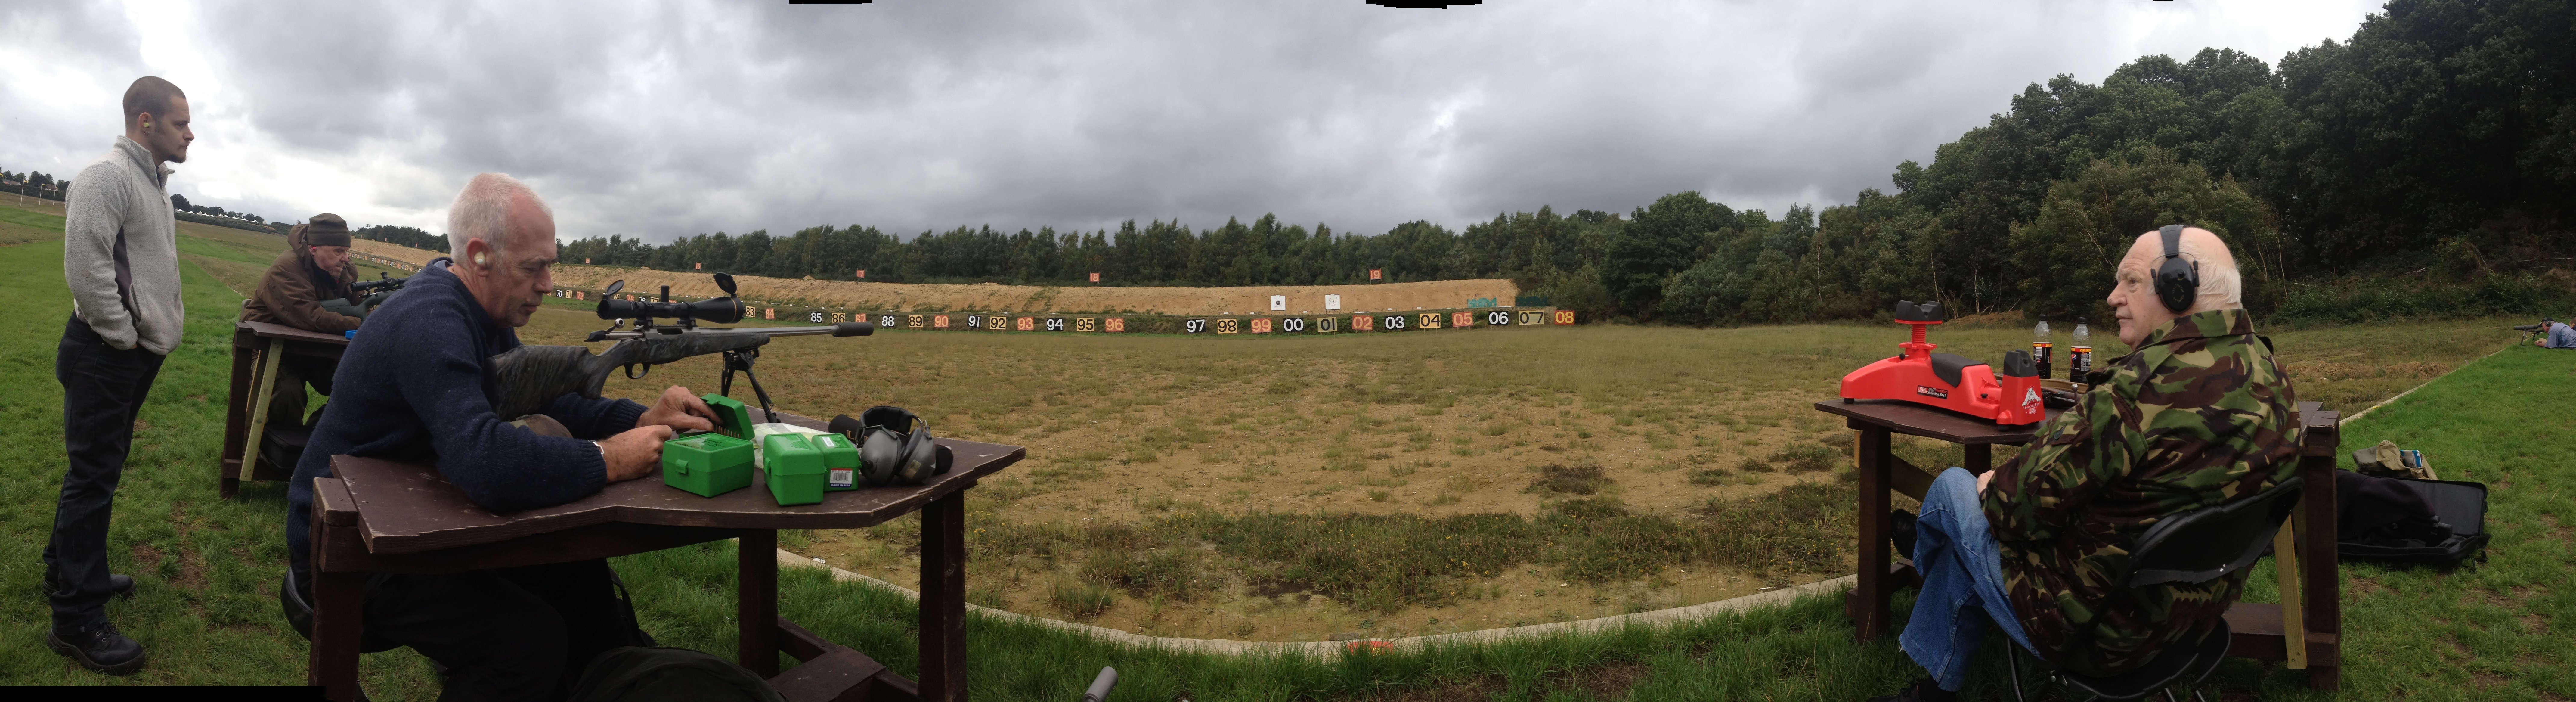 ladies olympic team.Panorama Century Range Bisley